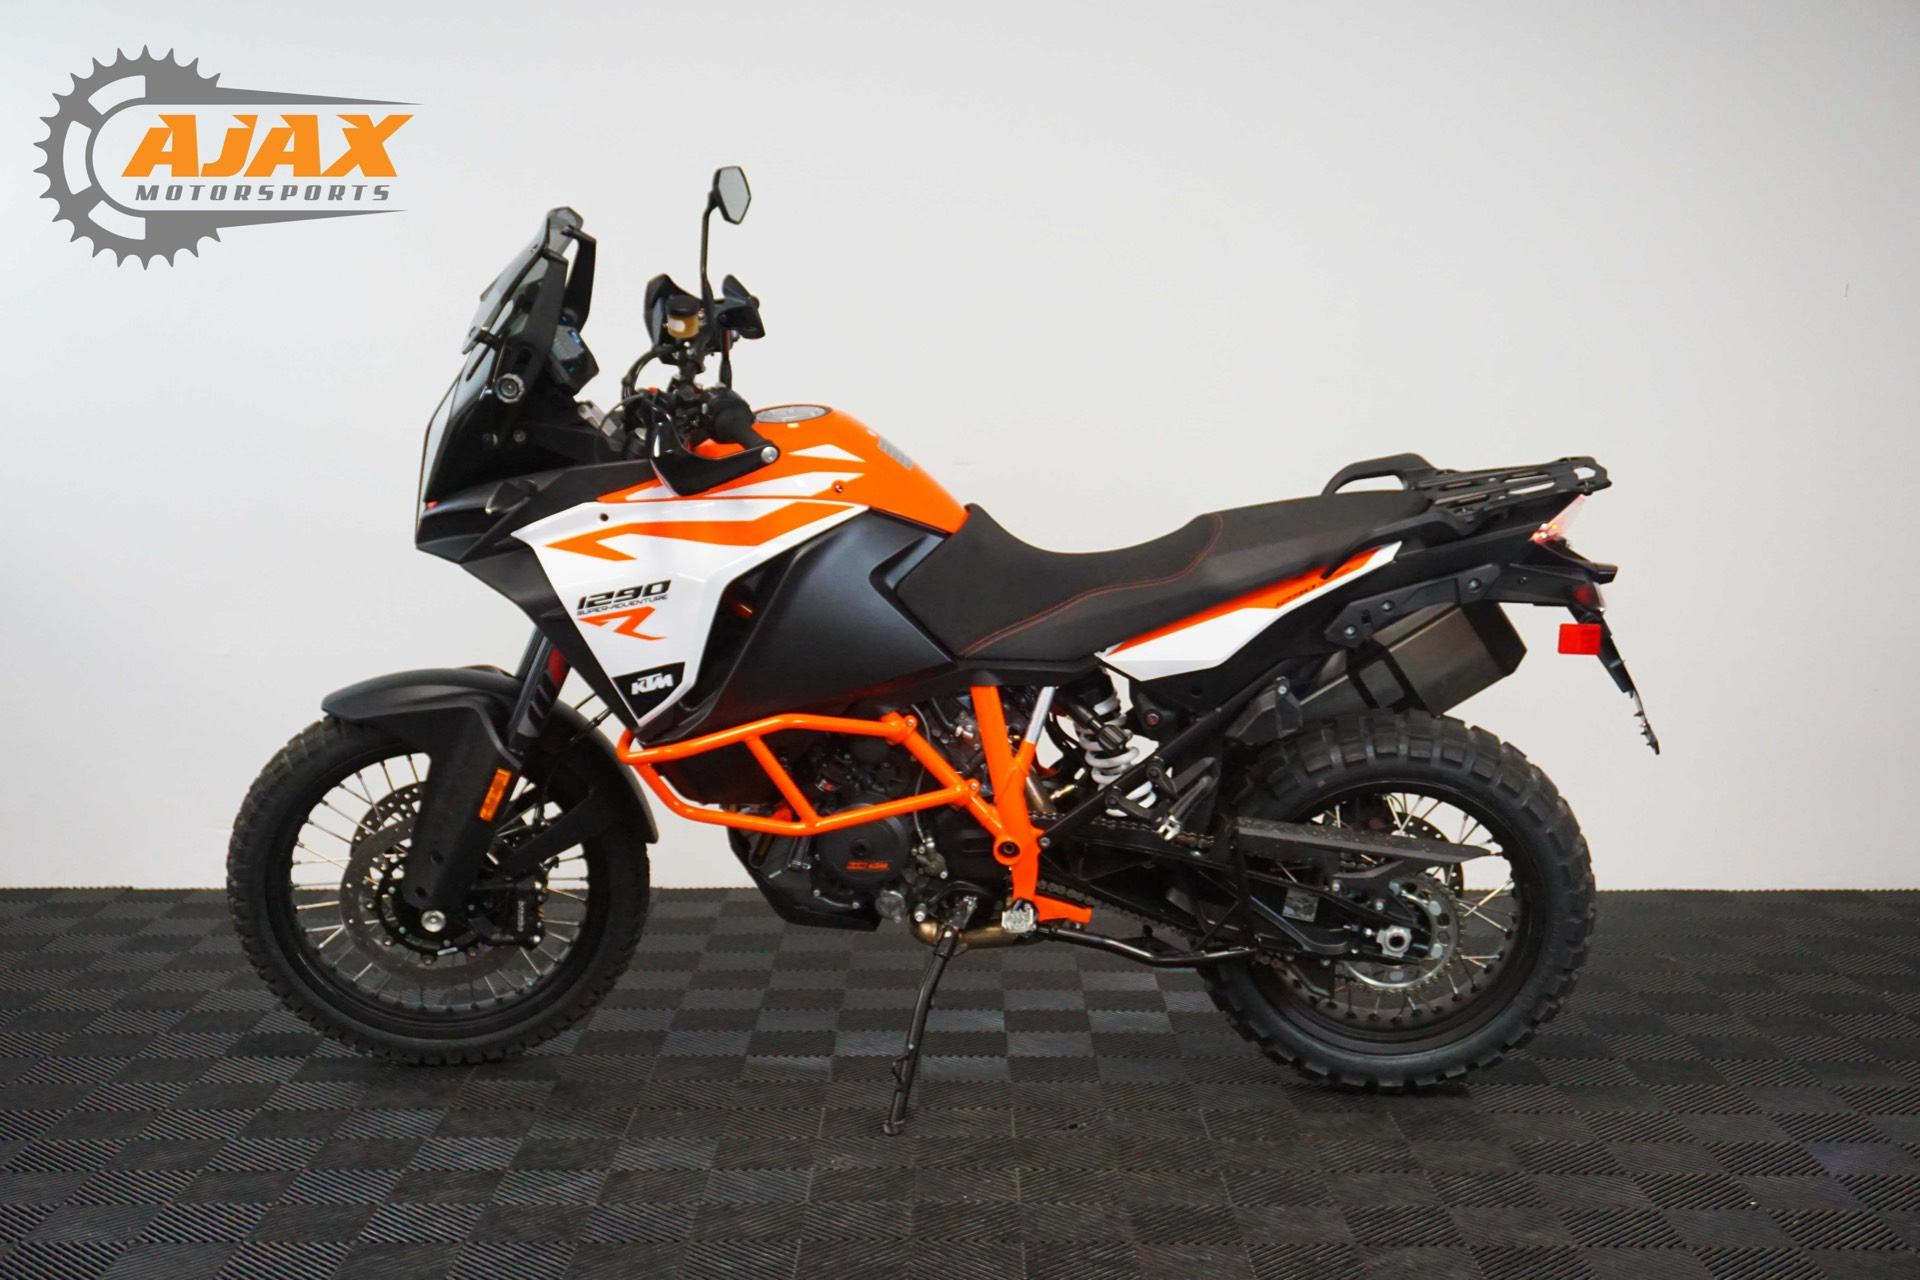 new 2018 ktm 1290 super adventure r motorcycles in. Black Bedroom Furniture Sets. Home Design Ideas